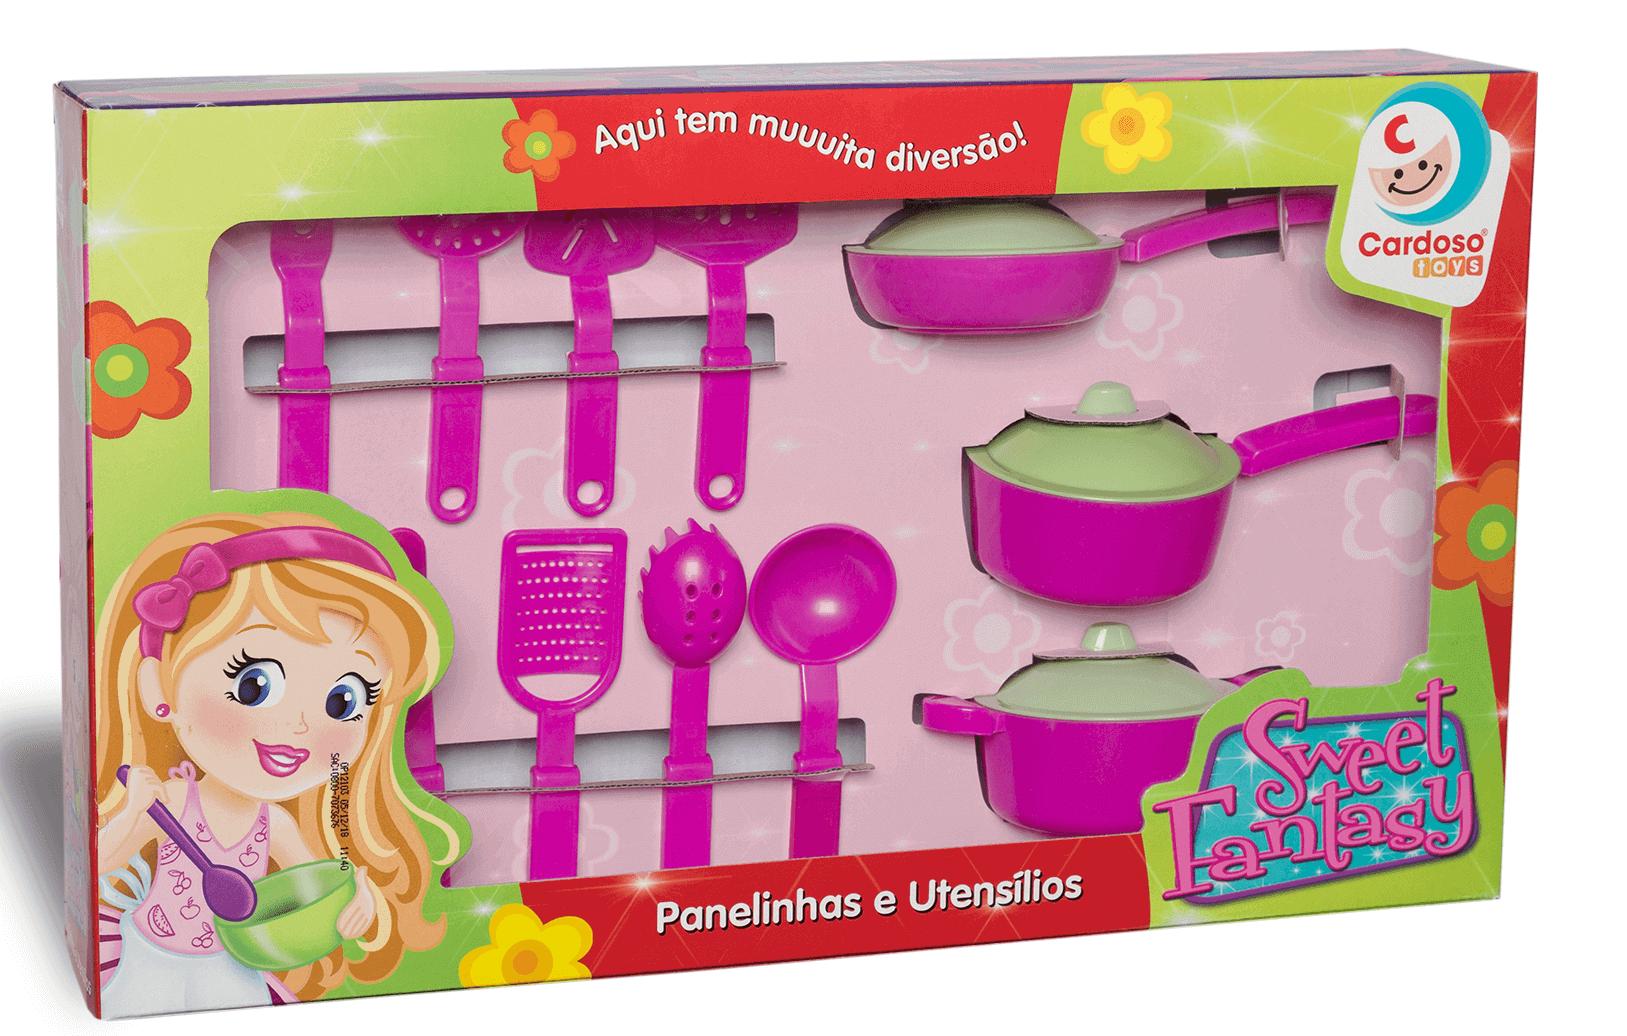 Conjunto Sweet Fantasy Panelinha e utensilios - Cardosos